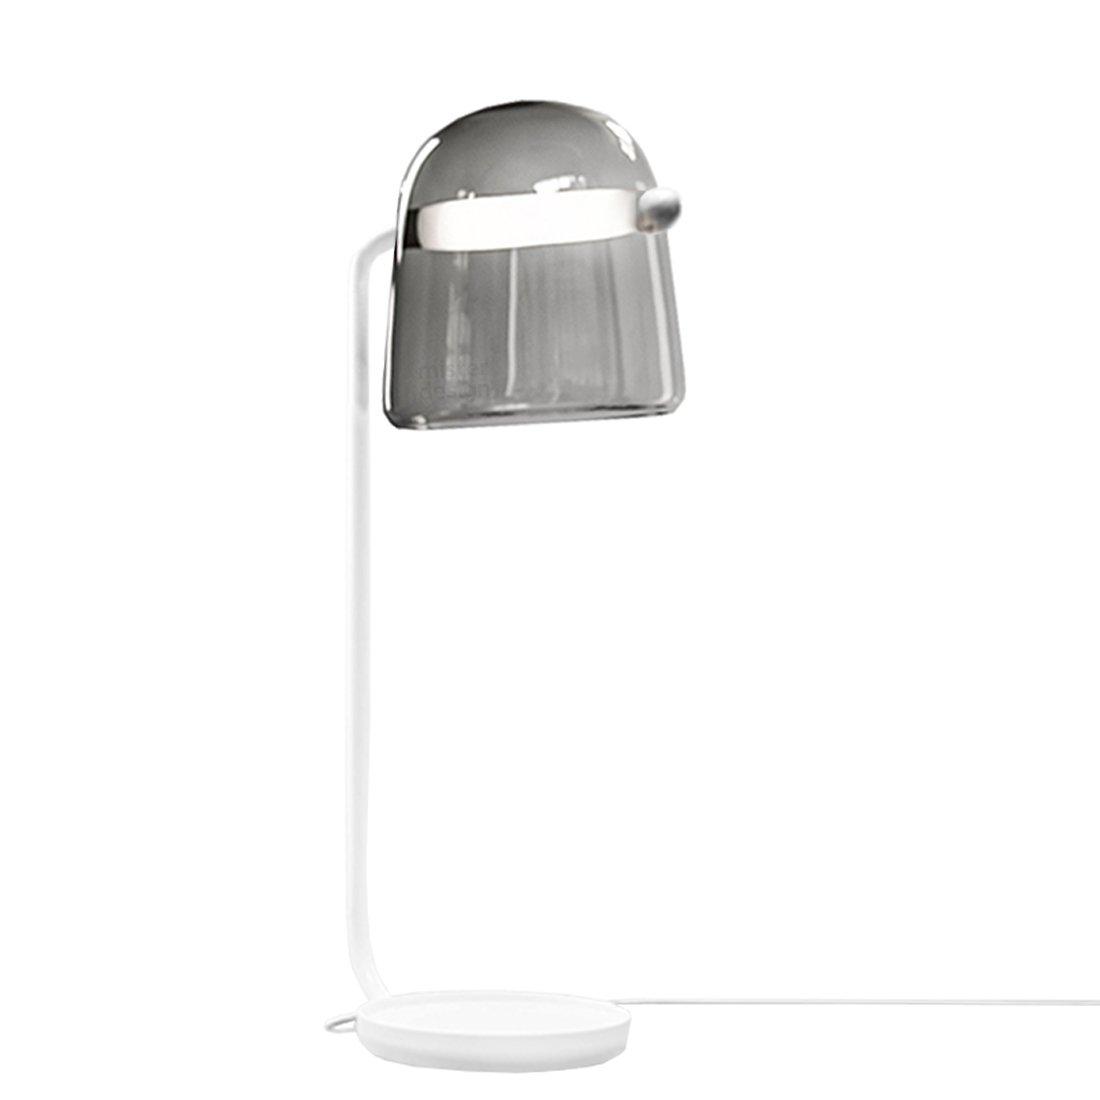 Brokis Mona Vloerlamp Large Donkergrijs - Witte Body